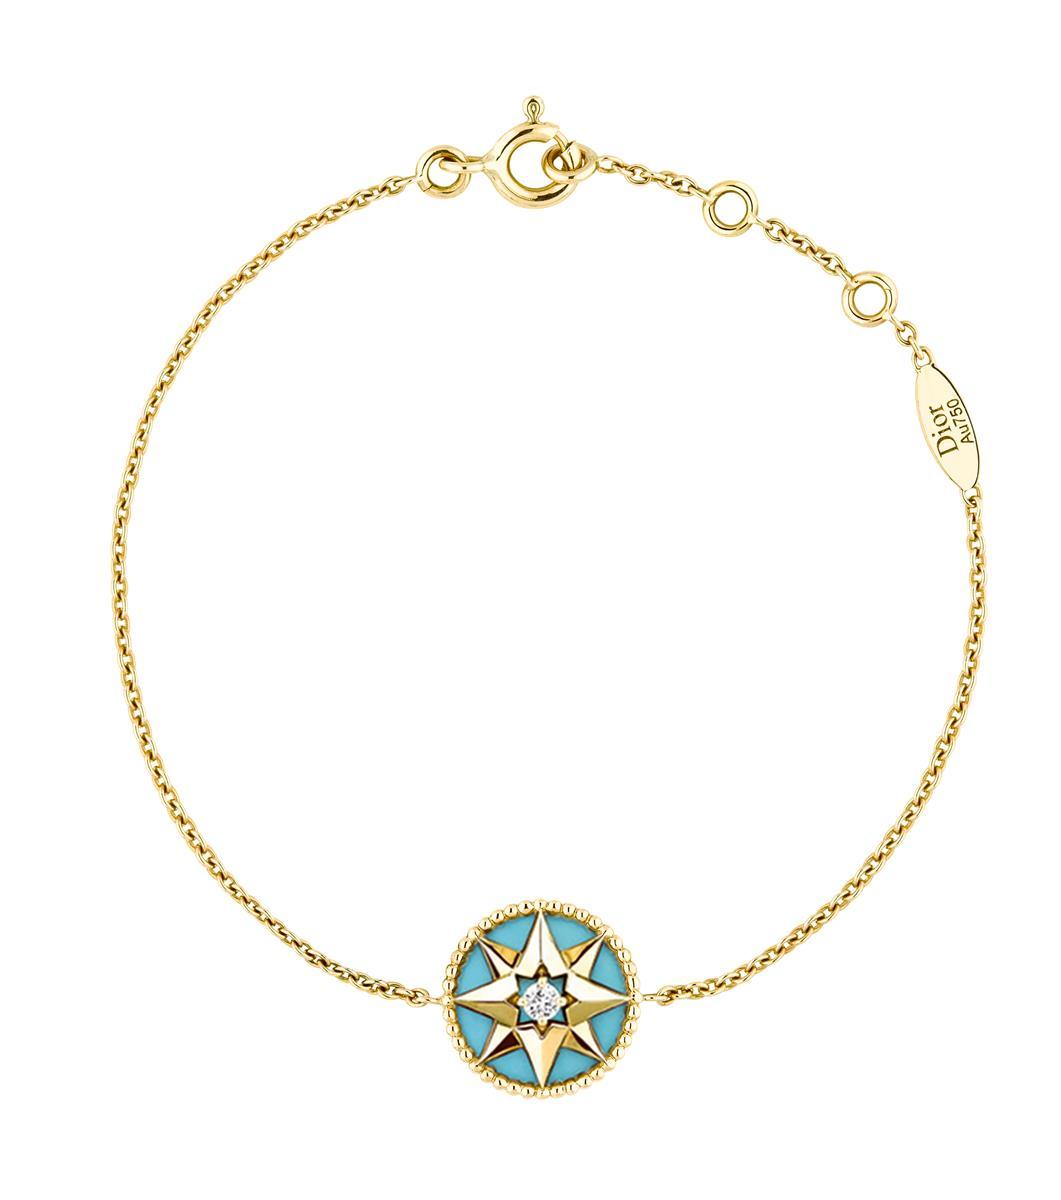 jewellery_JRDV95002_1 (Copy)